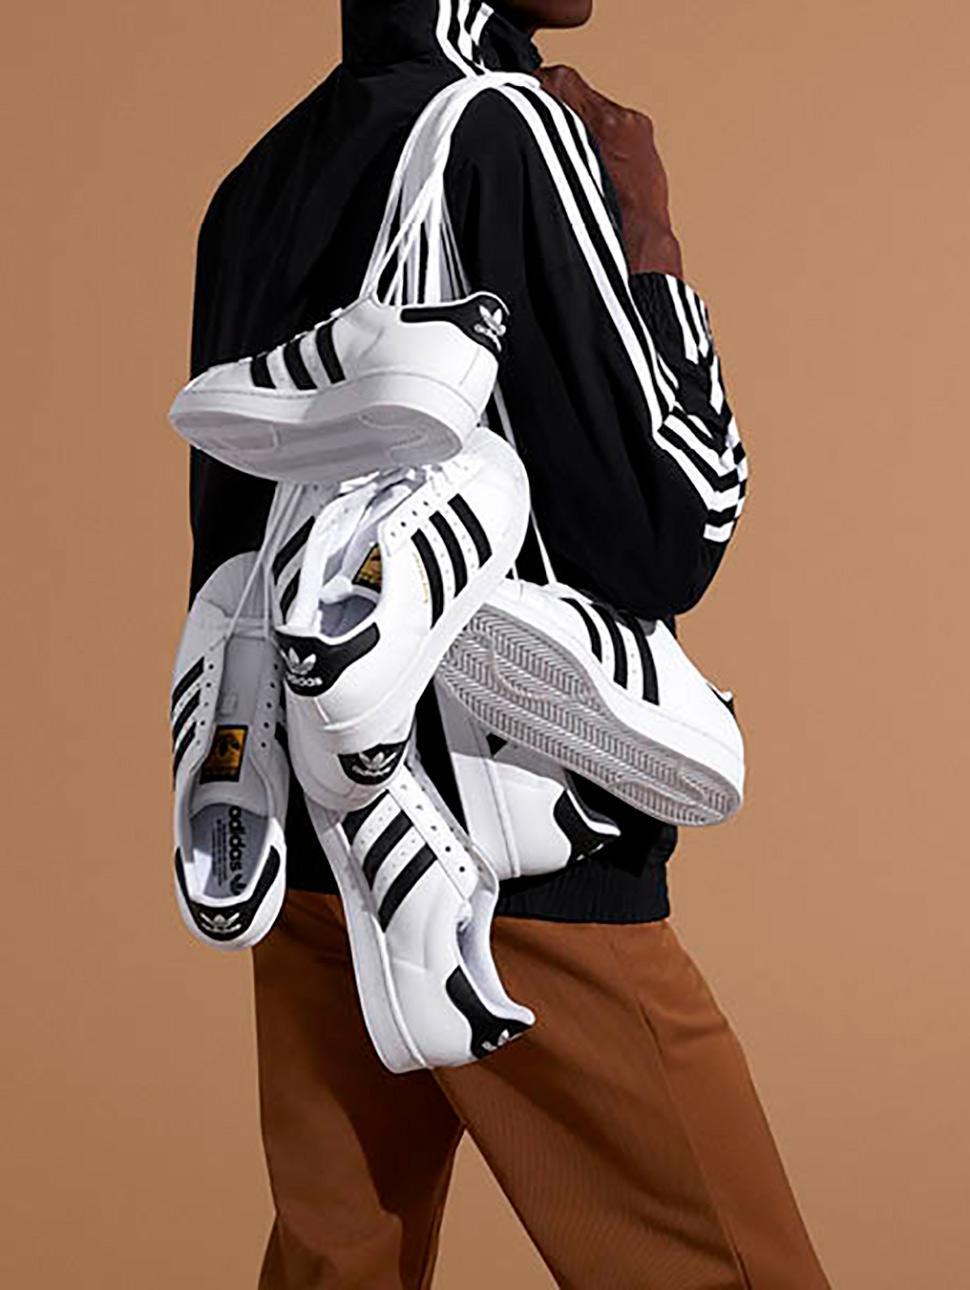 Adidas Superstar Facts